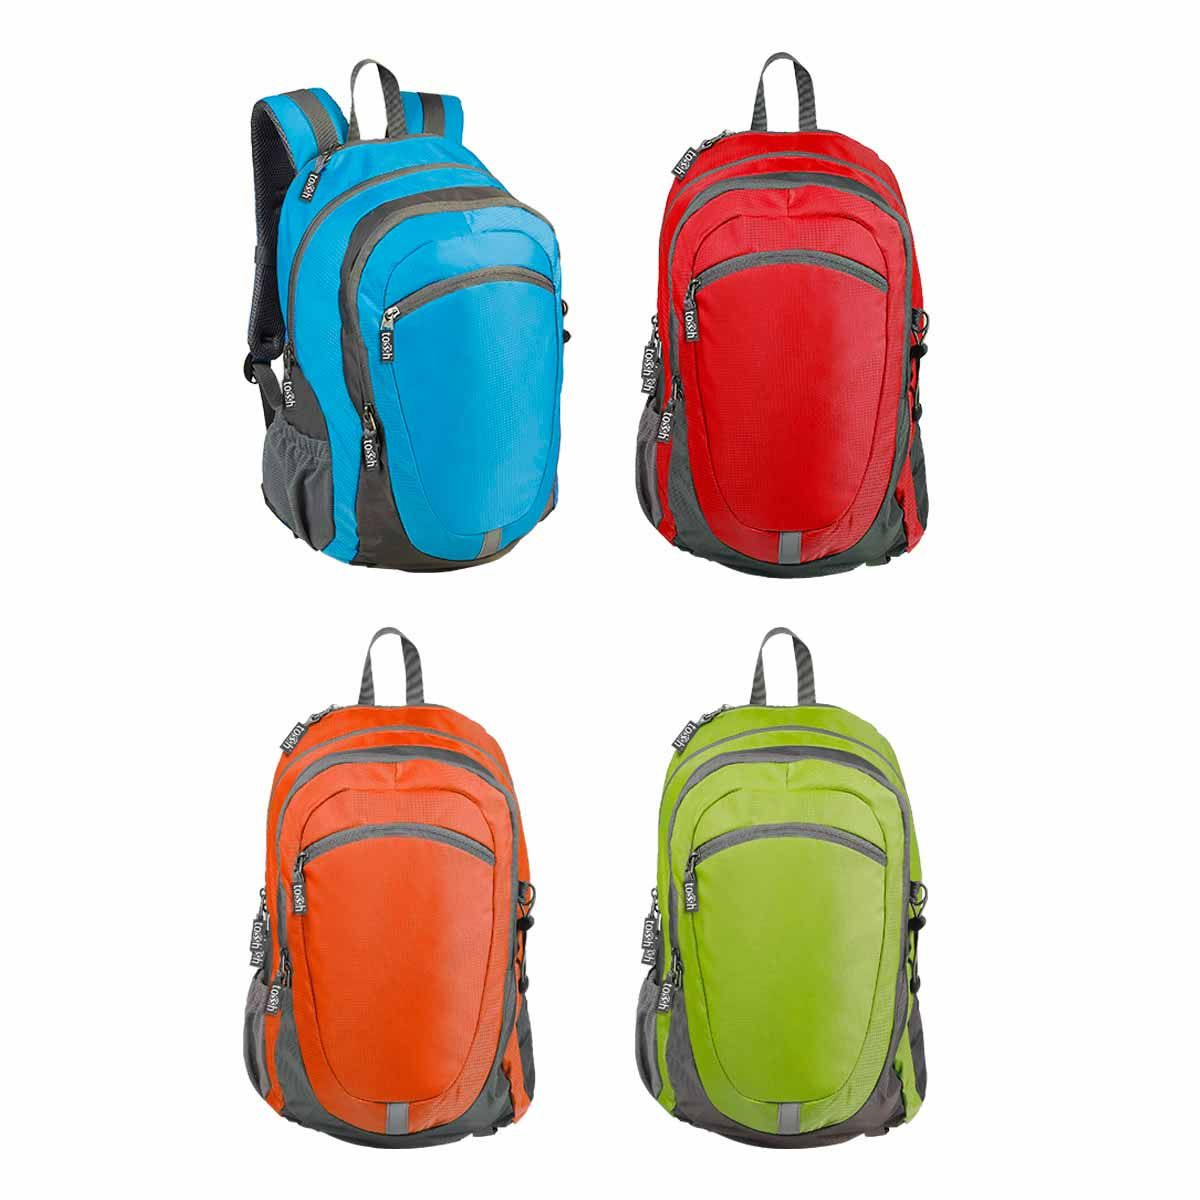 Mochila backpack Aventura AP-342